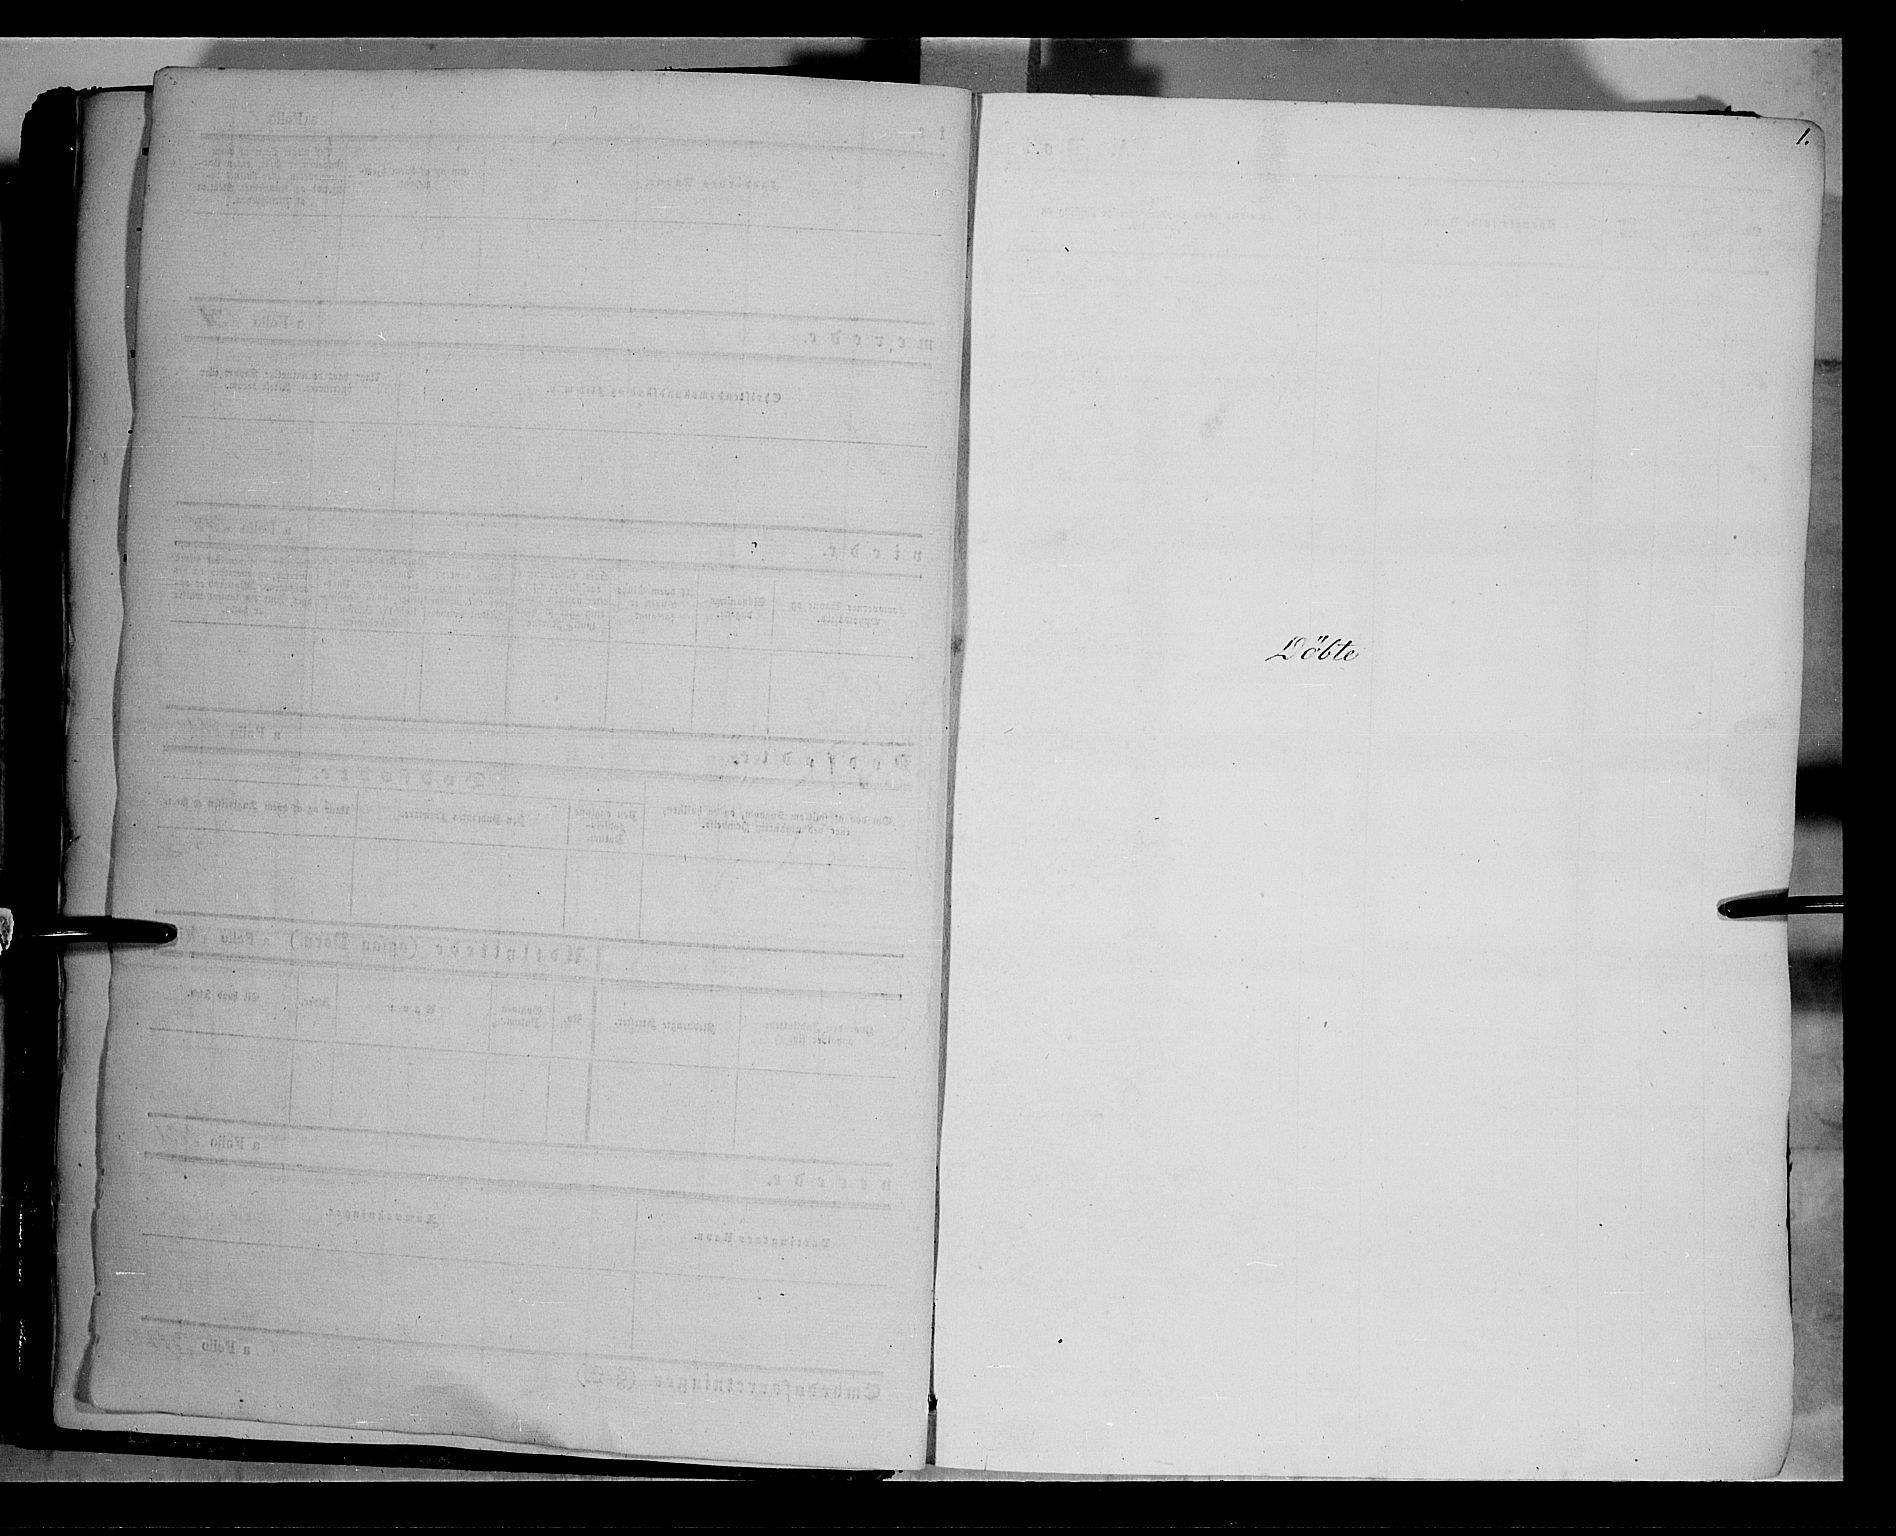 SAH, Vestre Toten prestekontor, H/Ha/Haa/L0006: Ministerialbok nr. 6, 1856-1861, s. 1